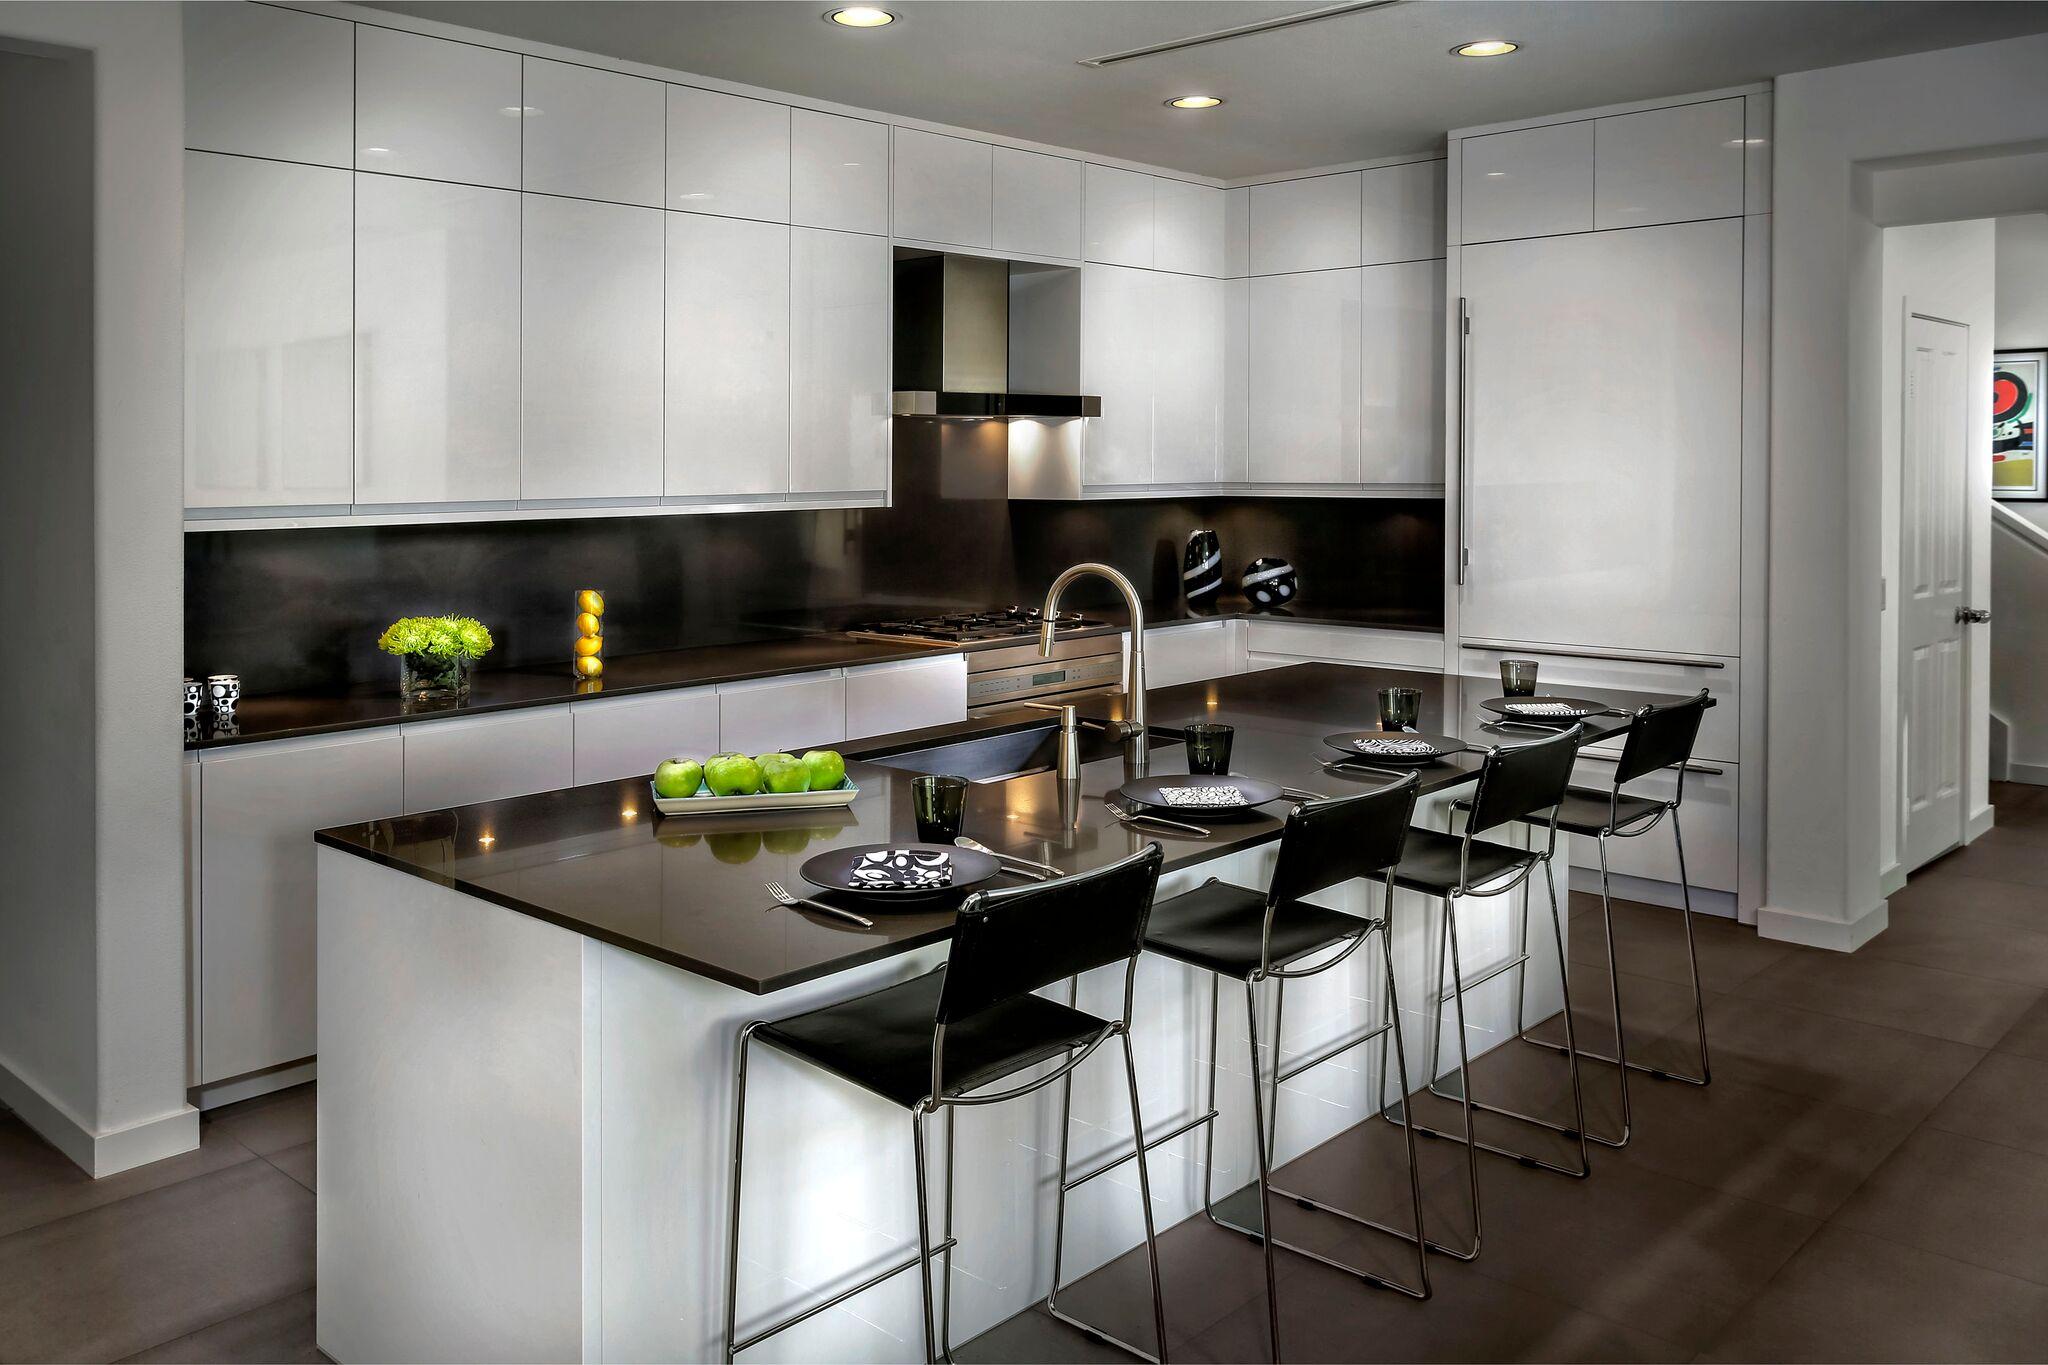 Laguna Beach Contemporary kitchen in high gloss lacquer